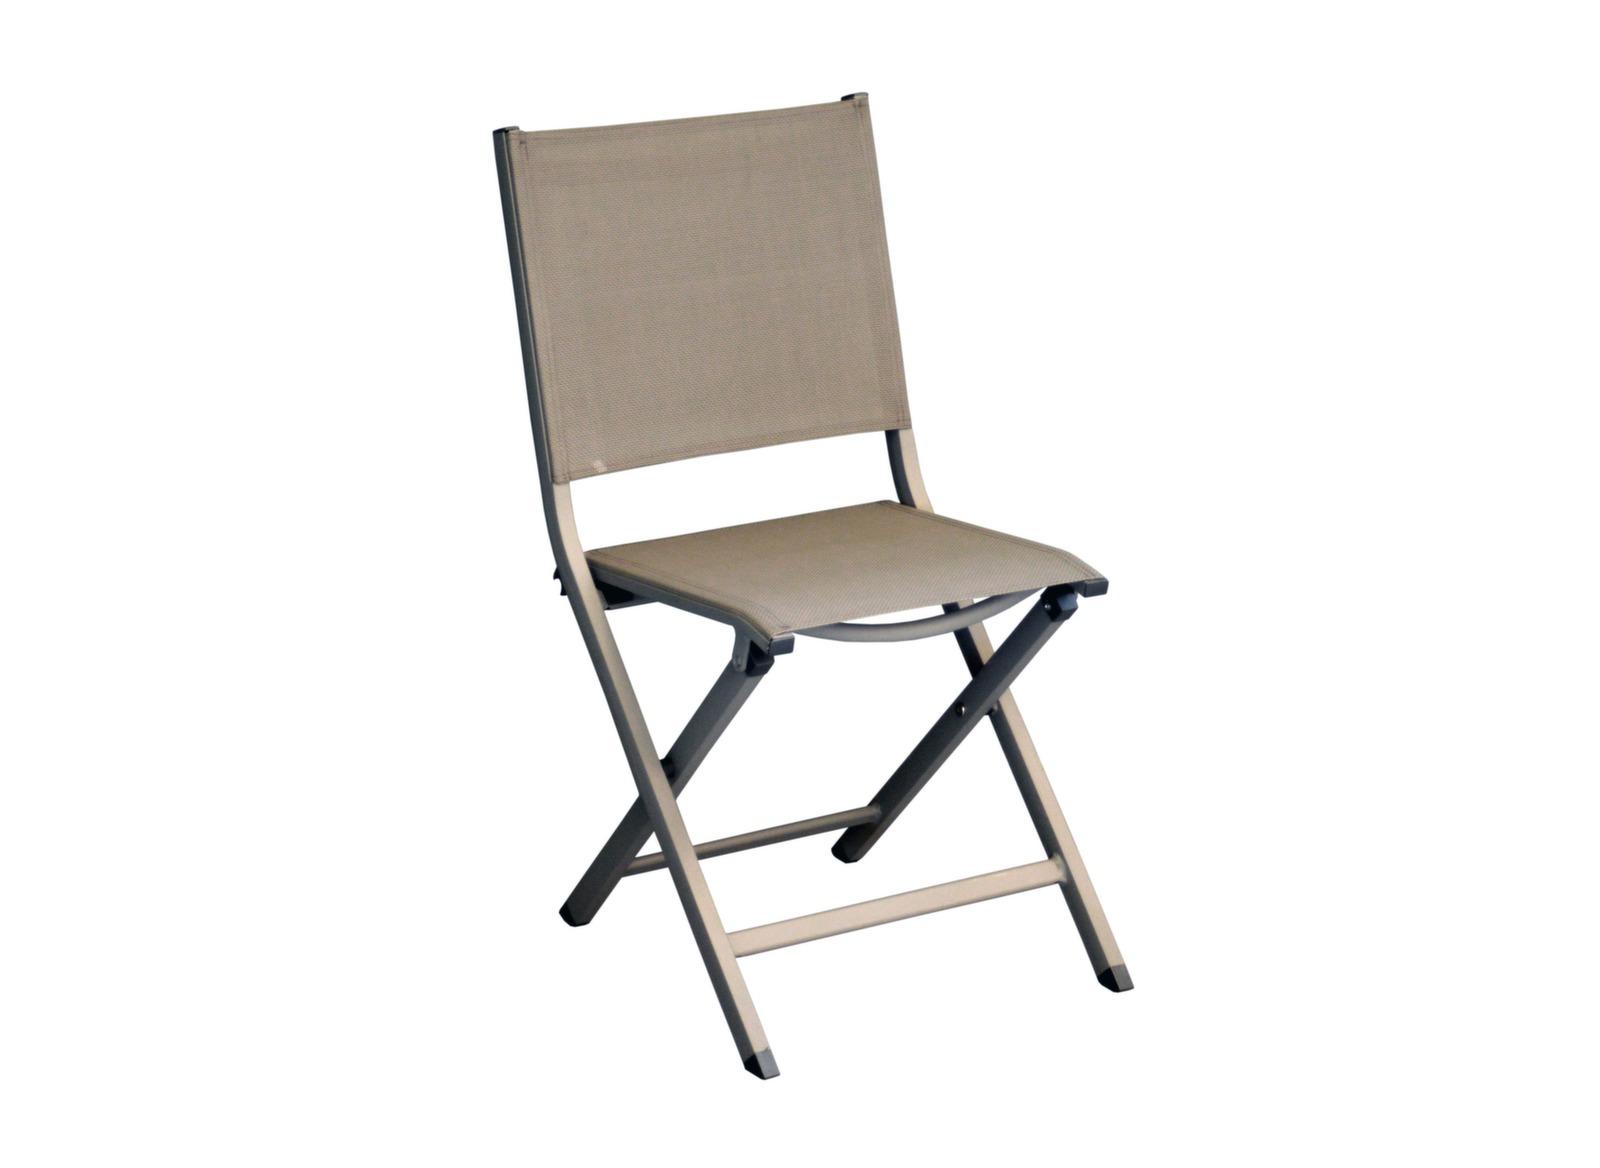 Guéridon Caly 90 cm + 2 chaises pliantes Théma